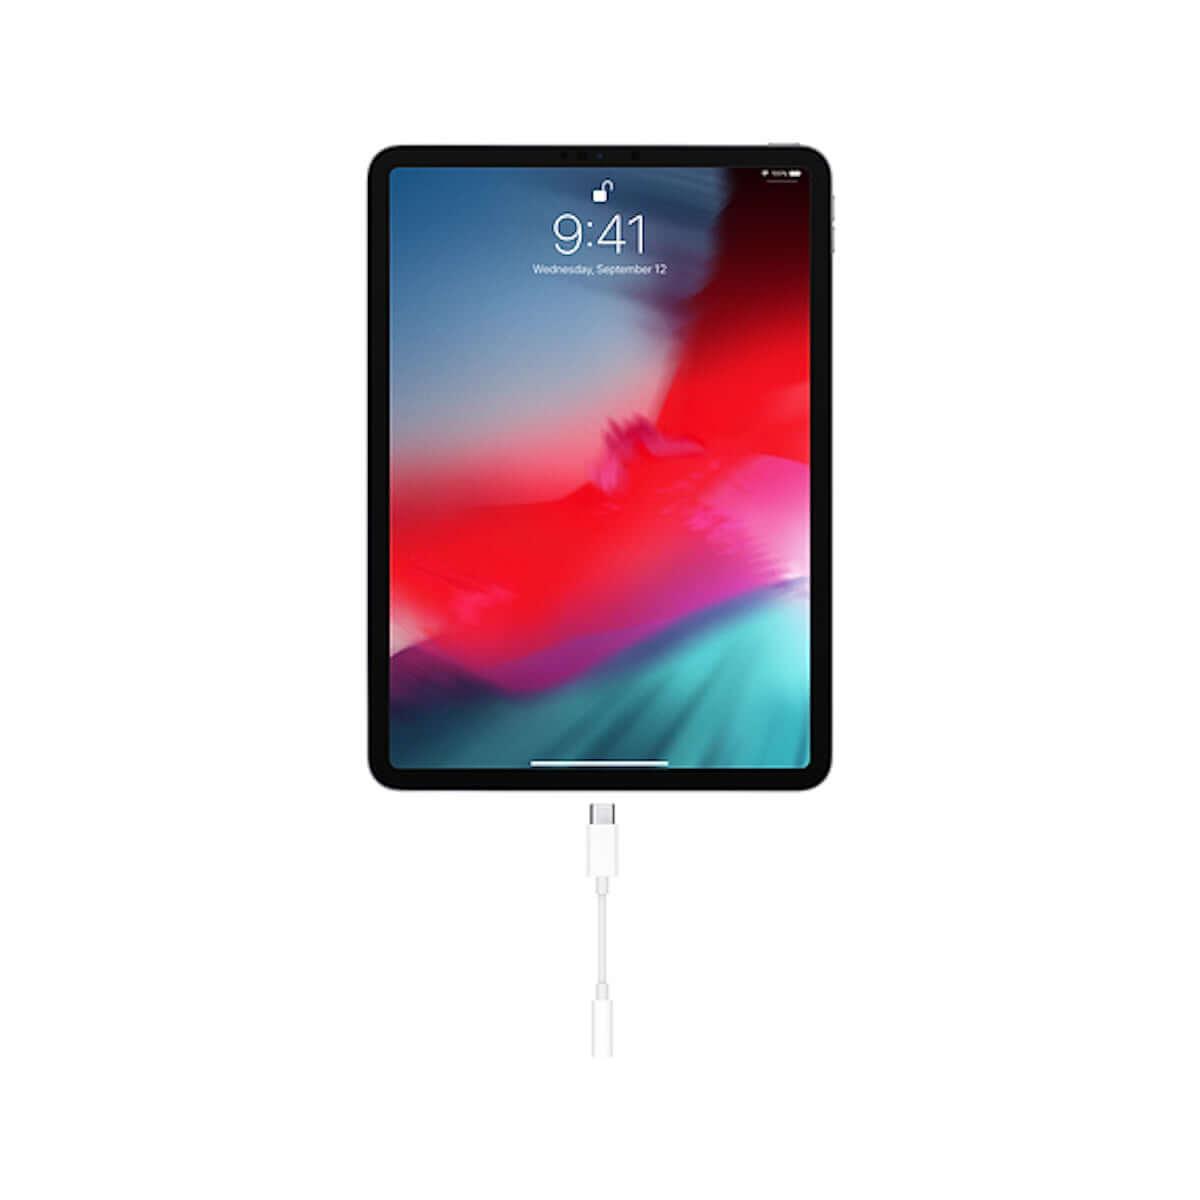 iPad Proからもイヤホンジャックが消えた!「USB-C - 3.5 mmヘッドフォンジャックアダプタ」が1,000円で販売開始! 6e99b8480457e8184c4dbd0288c4ffe7-1200x1200